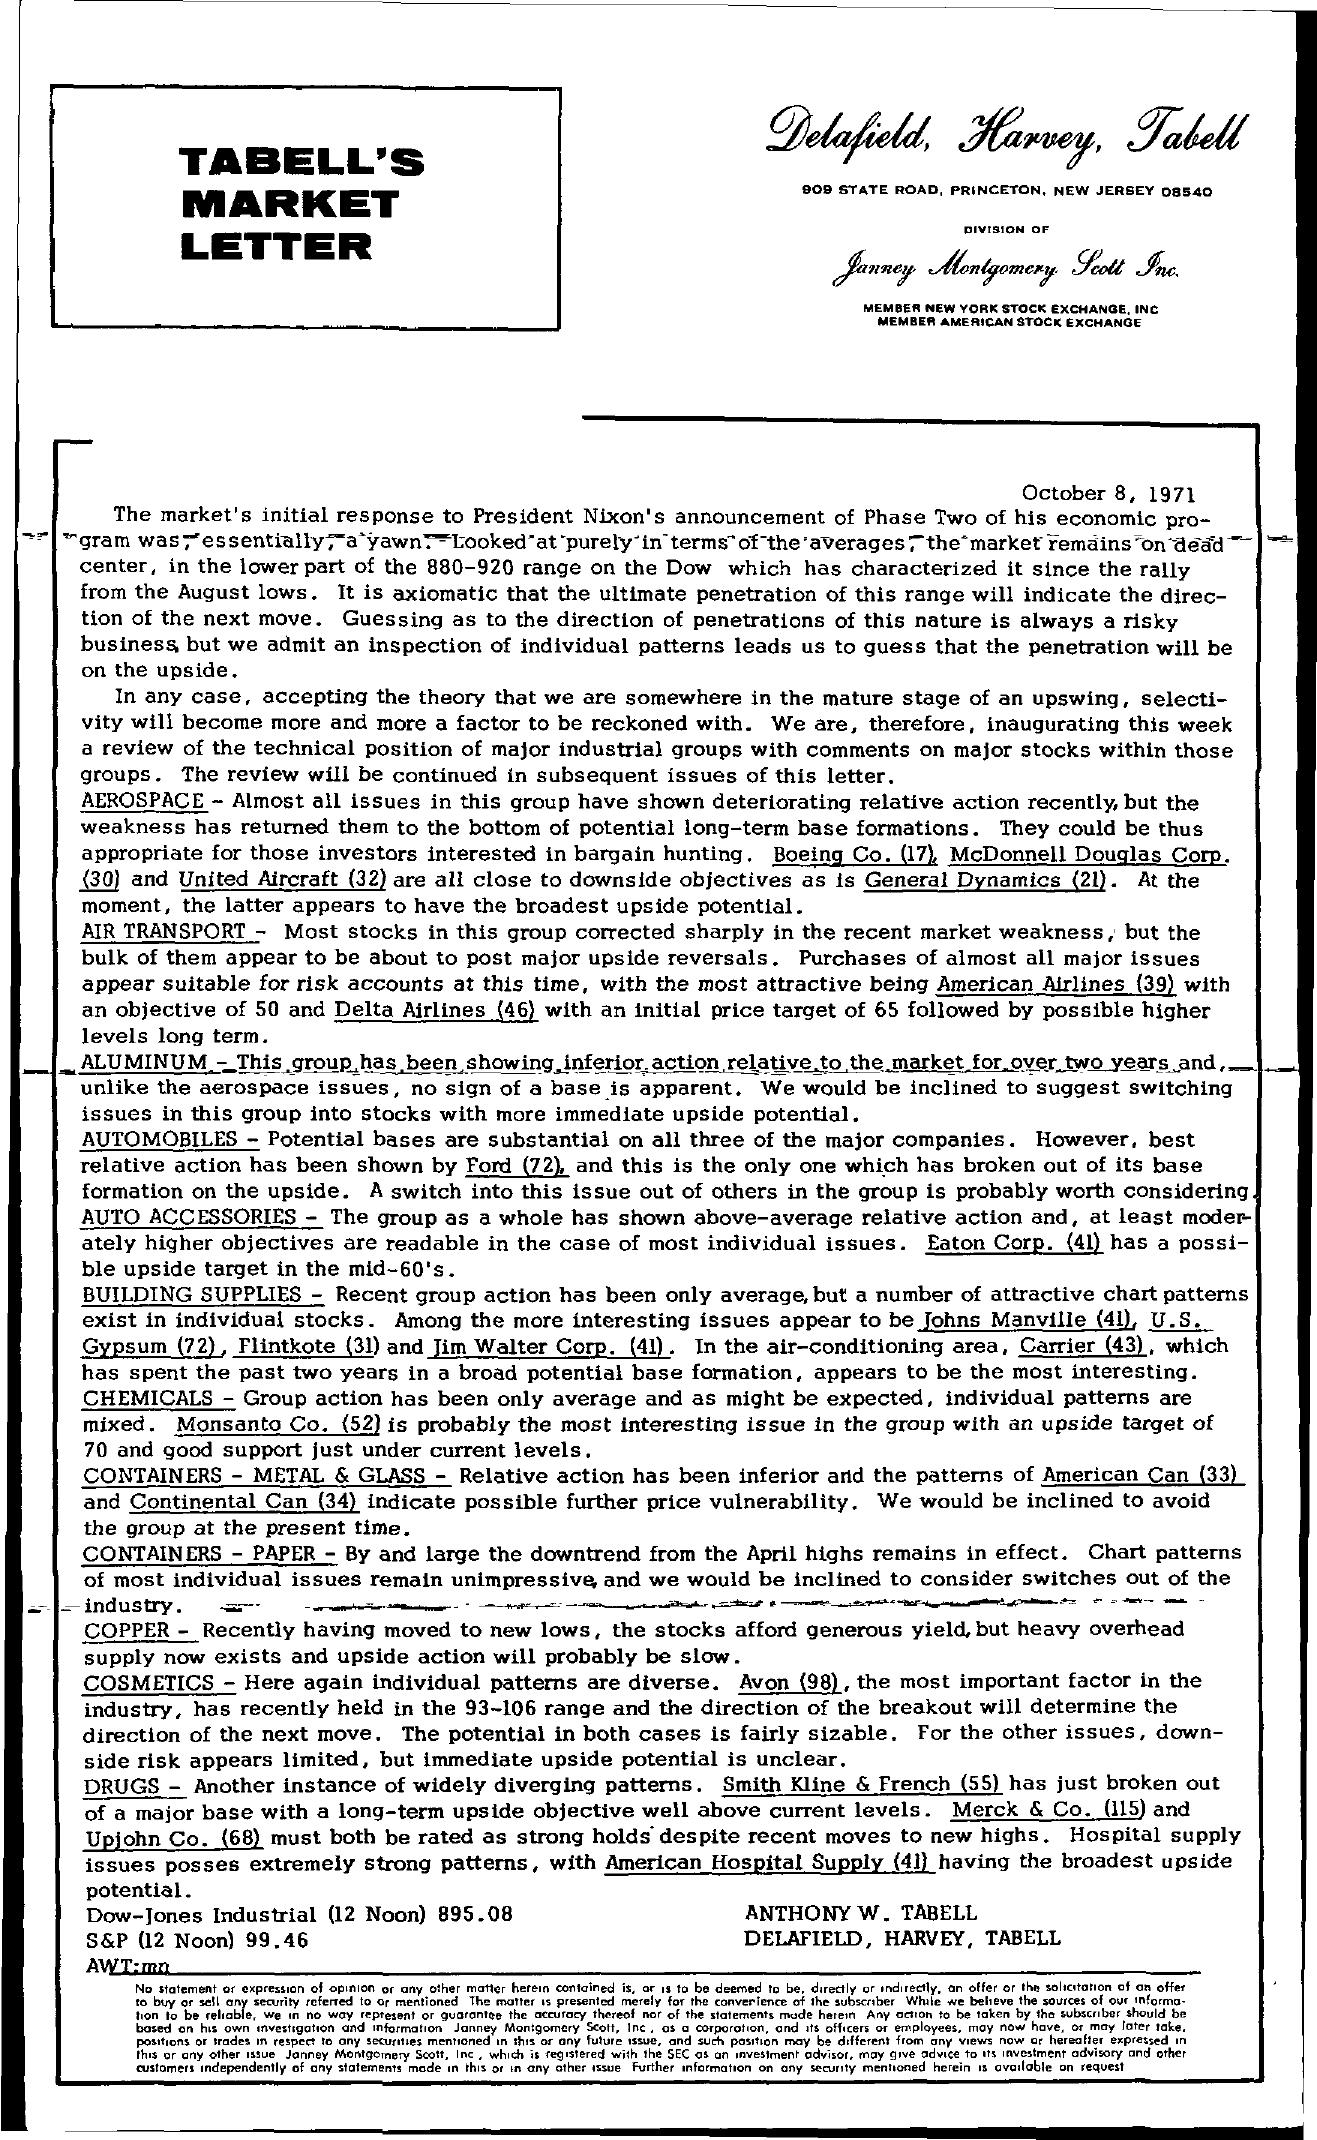 Tabell's Market Letter - October 08, 1971